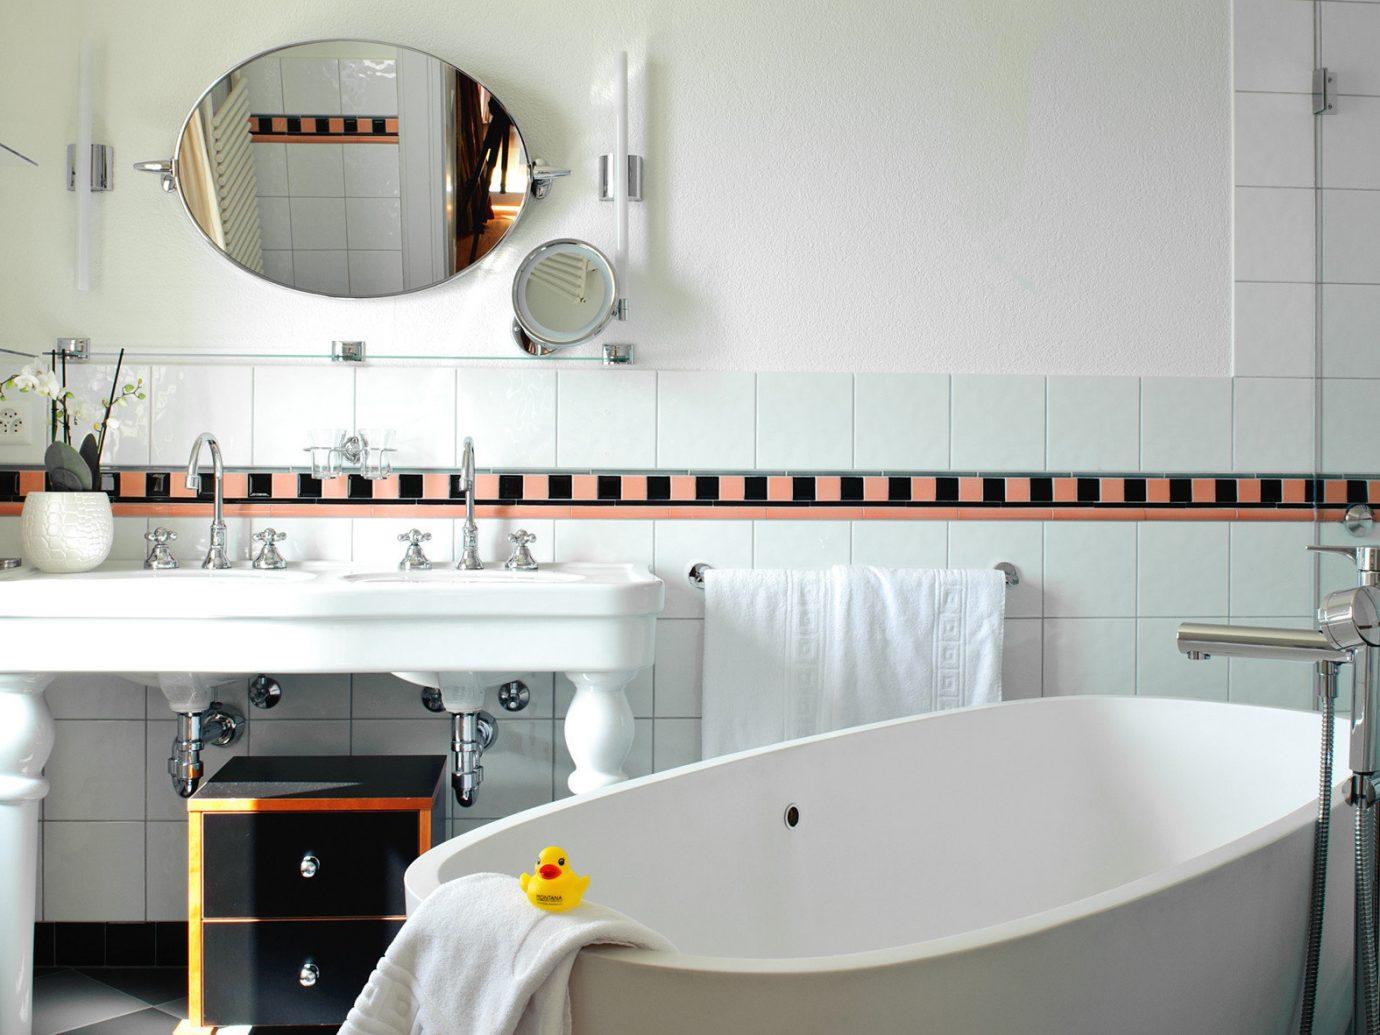 Hotels wall indoor room property bathroom floor home interior design sink Design vessel apartment cottage bathtub tub Bath tiled